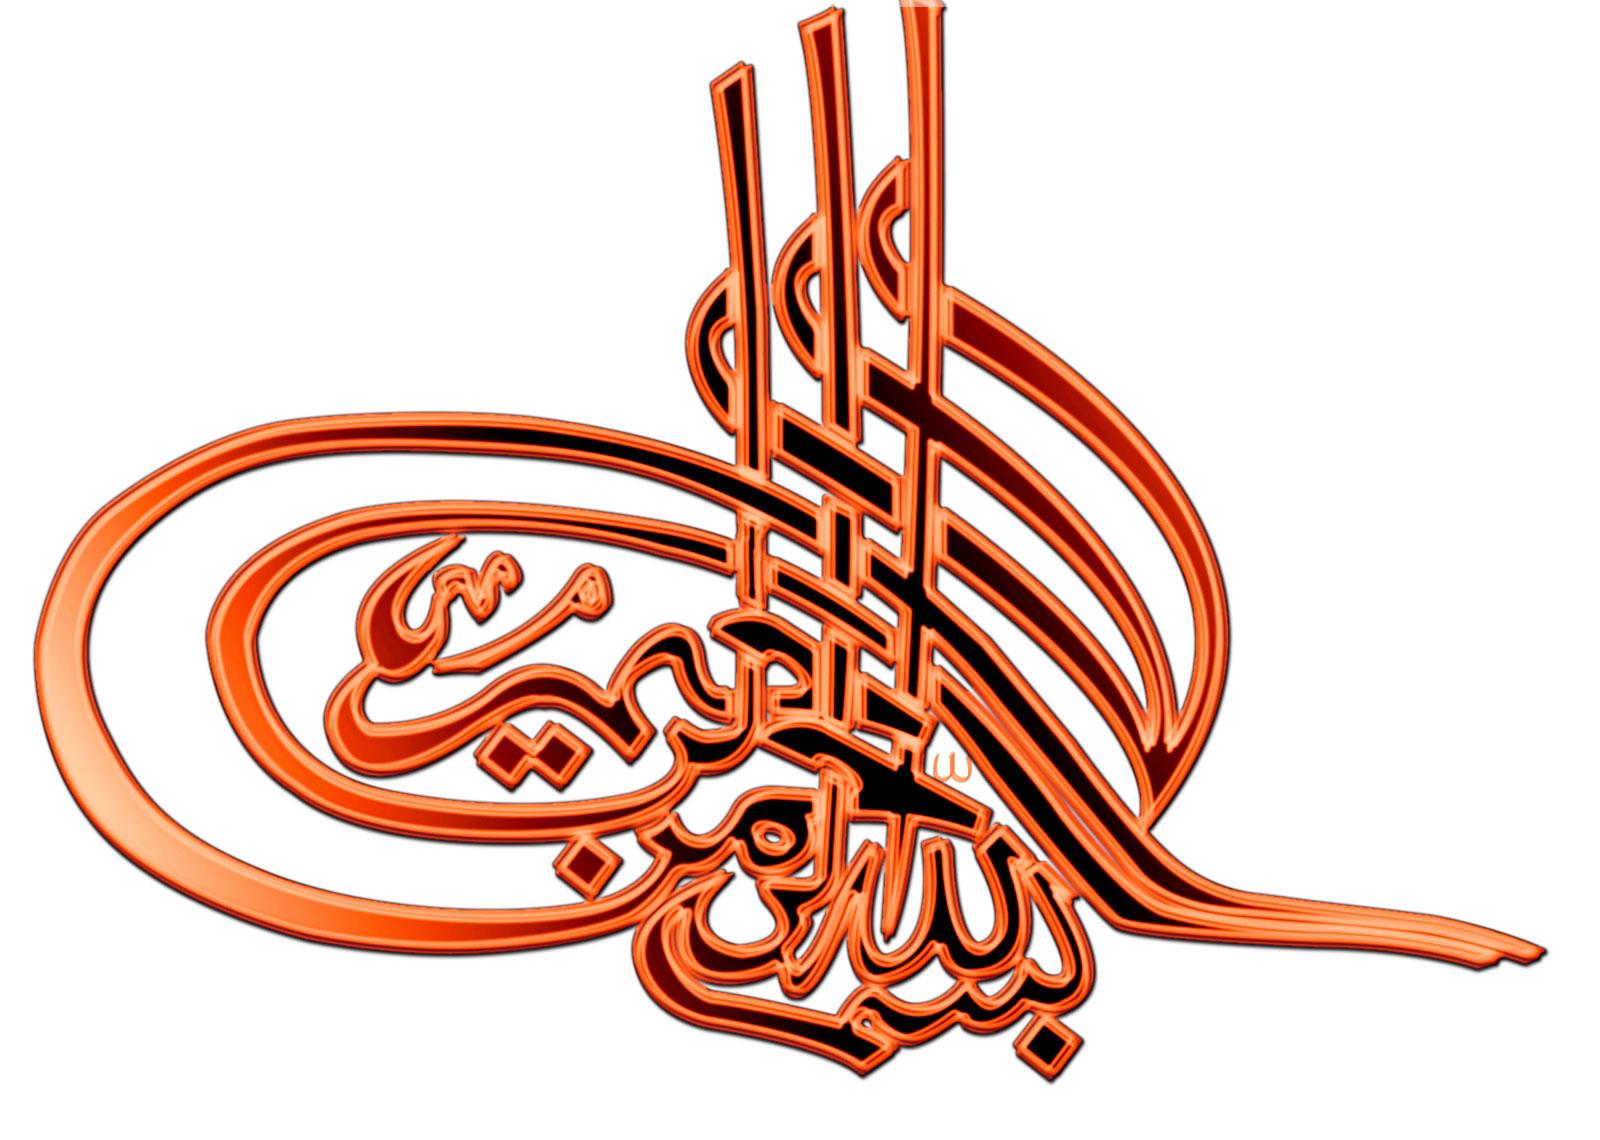 Widescreen Islamic Calligraphy Bismillah Calligraphy Blue